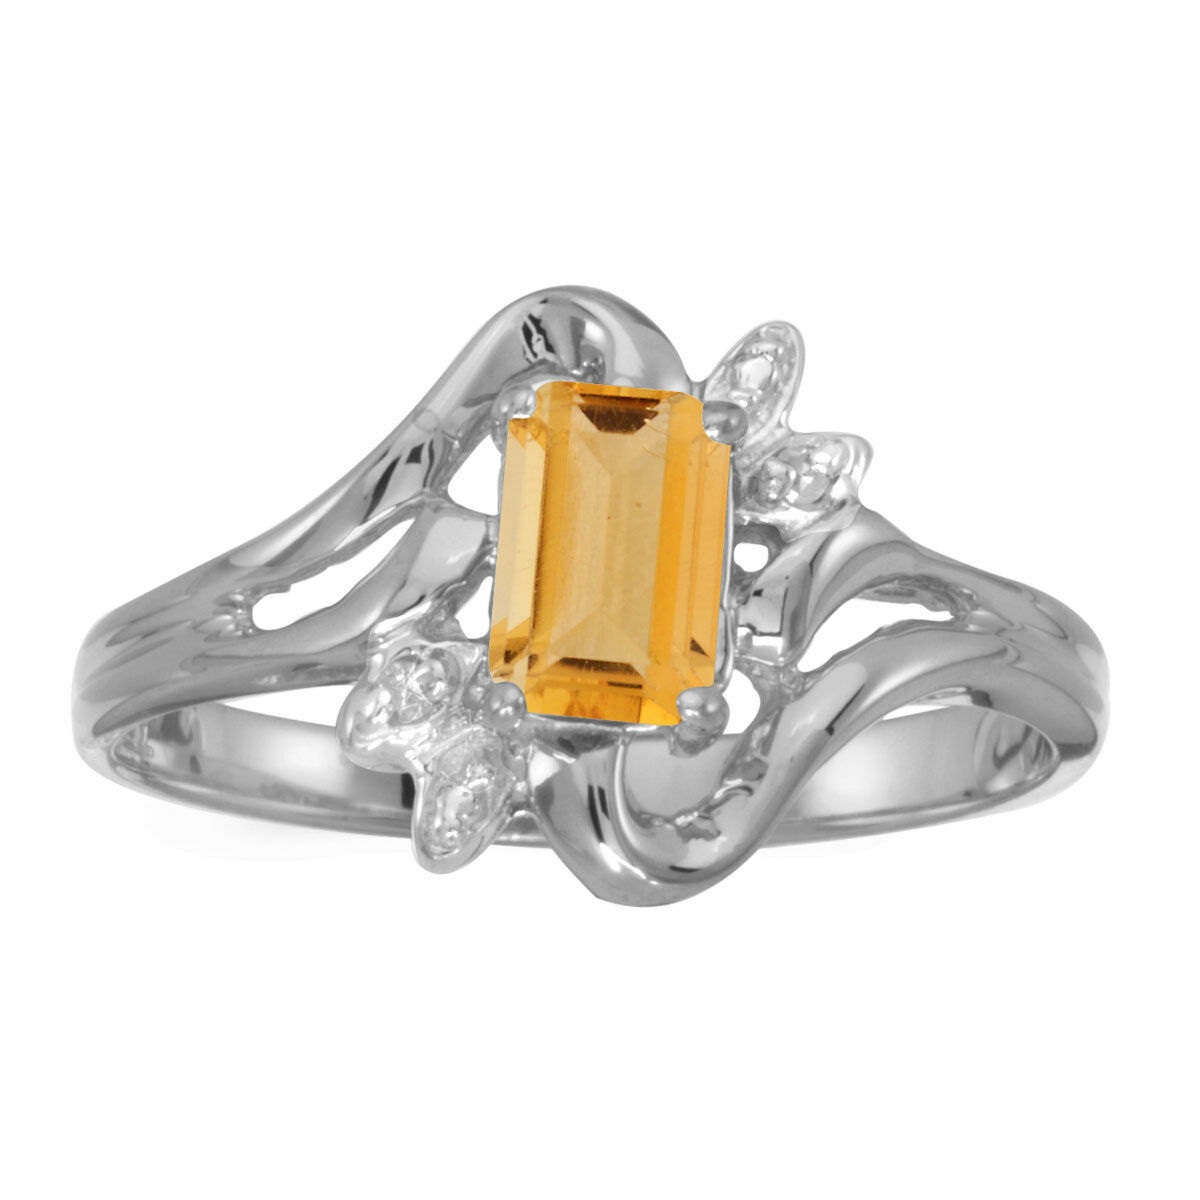 14k White gold Emerald-cut Citrine And Diamond Ring